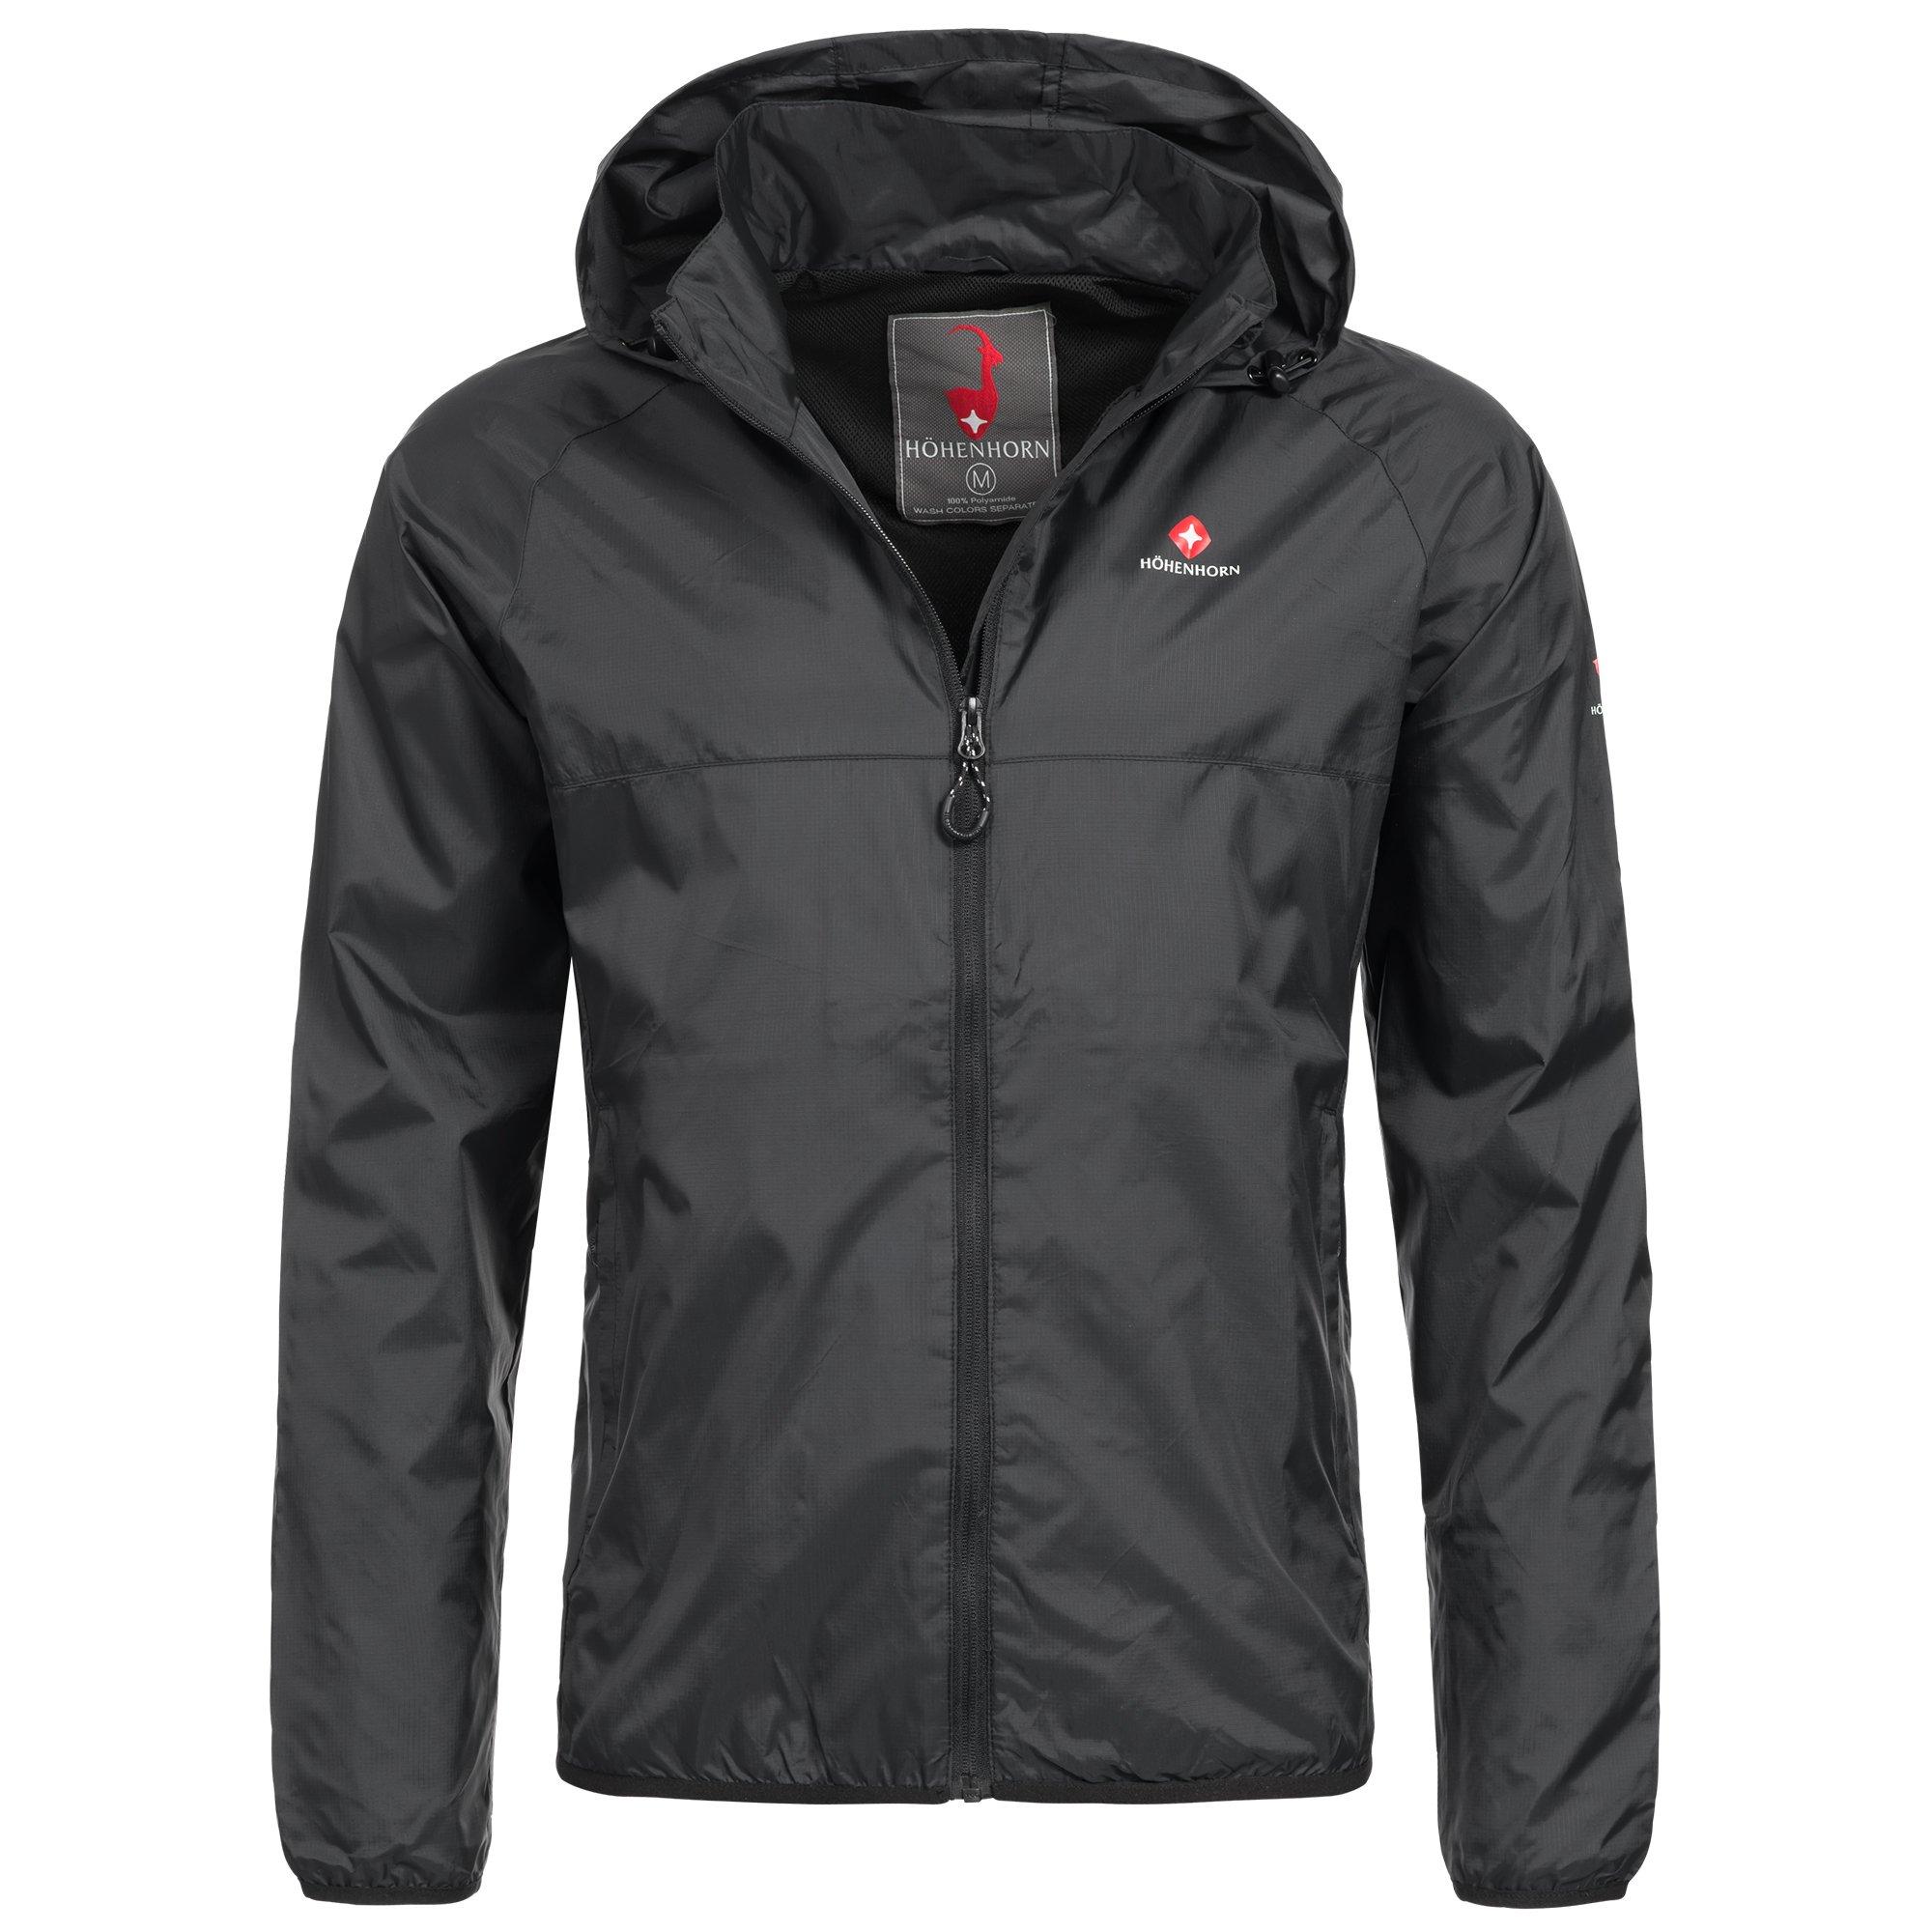 Herrenmode Freundschaftlich Regen Jacke Hose Anzug Regenschutz Regenanzug Regenjacke Regenhose Kapuze Regenbekleidung